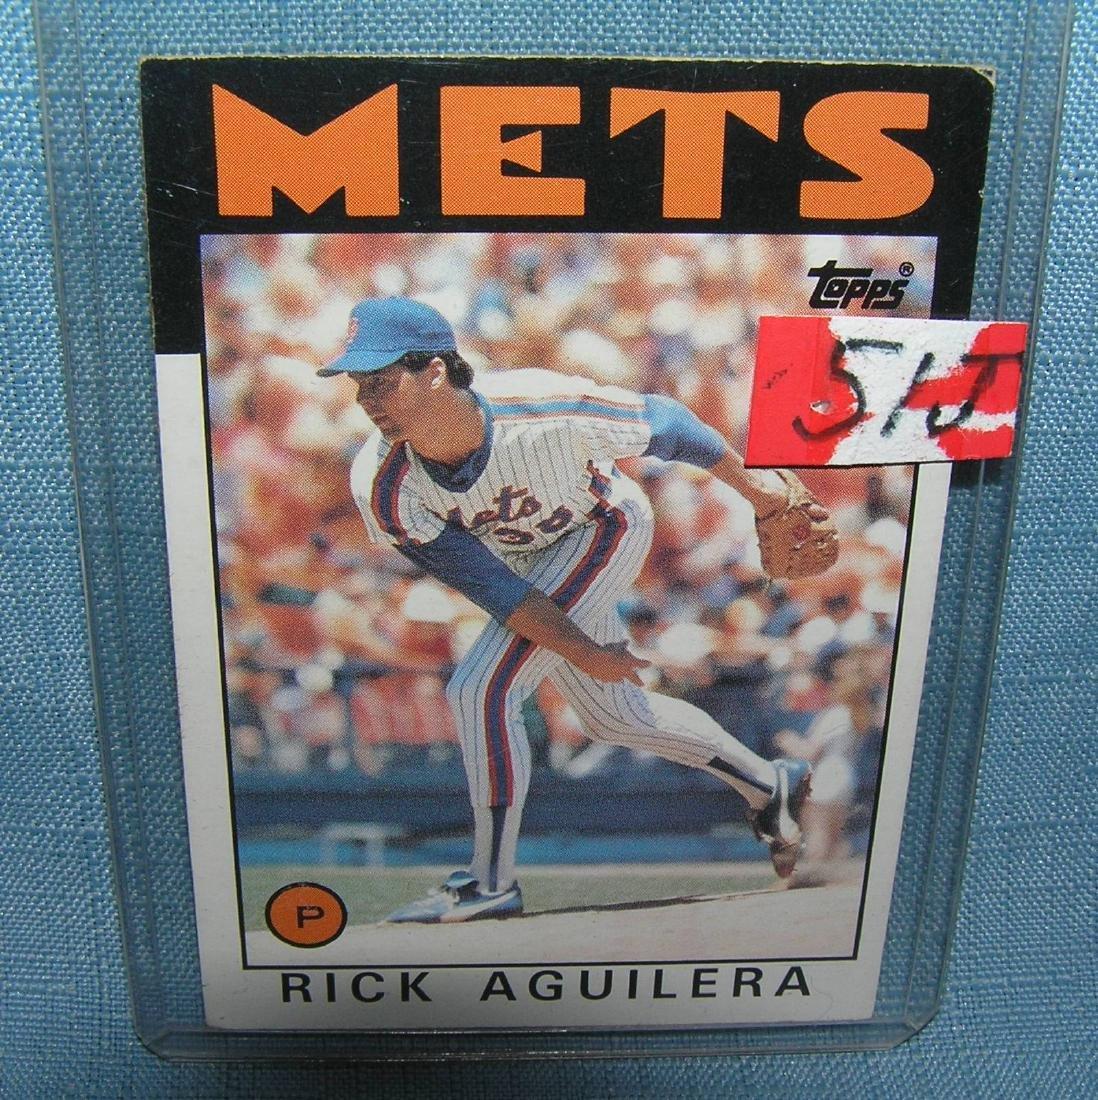 Rick Aguilera rookie baseball card